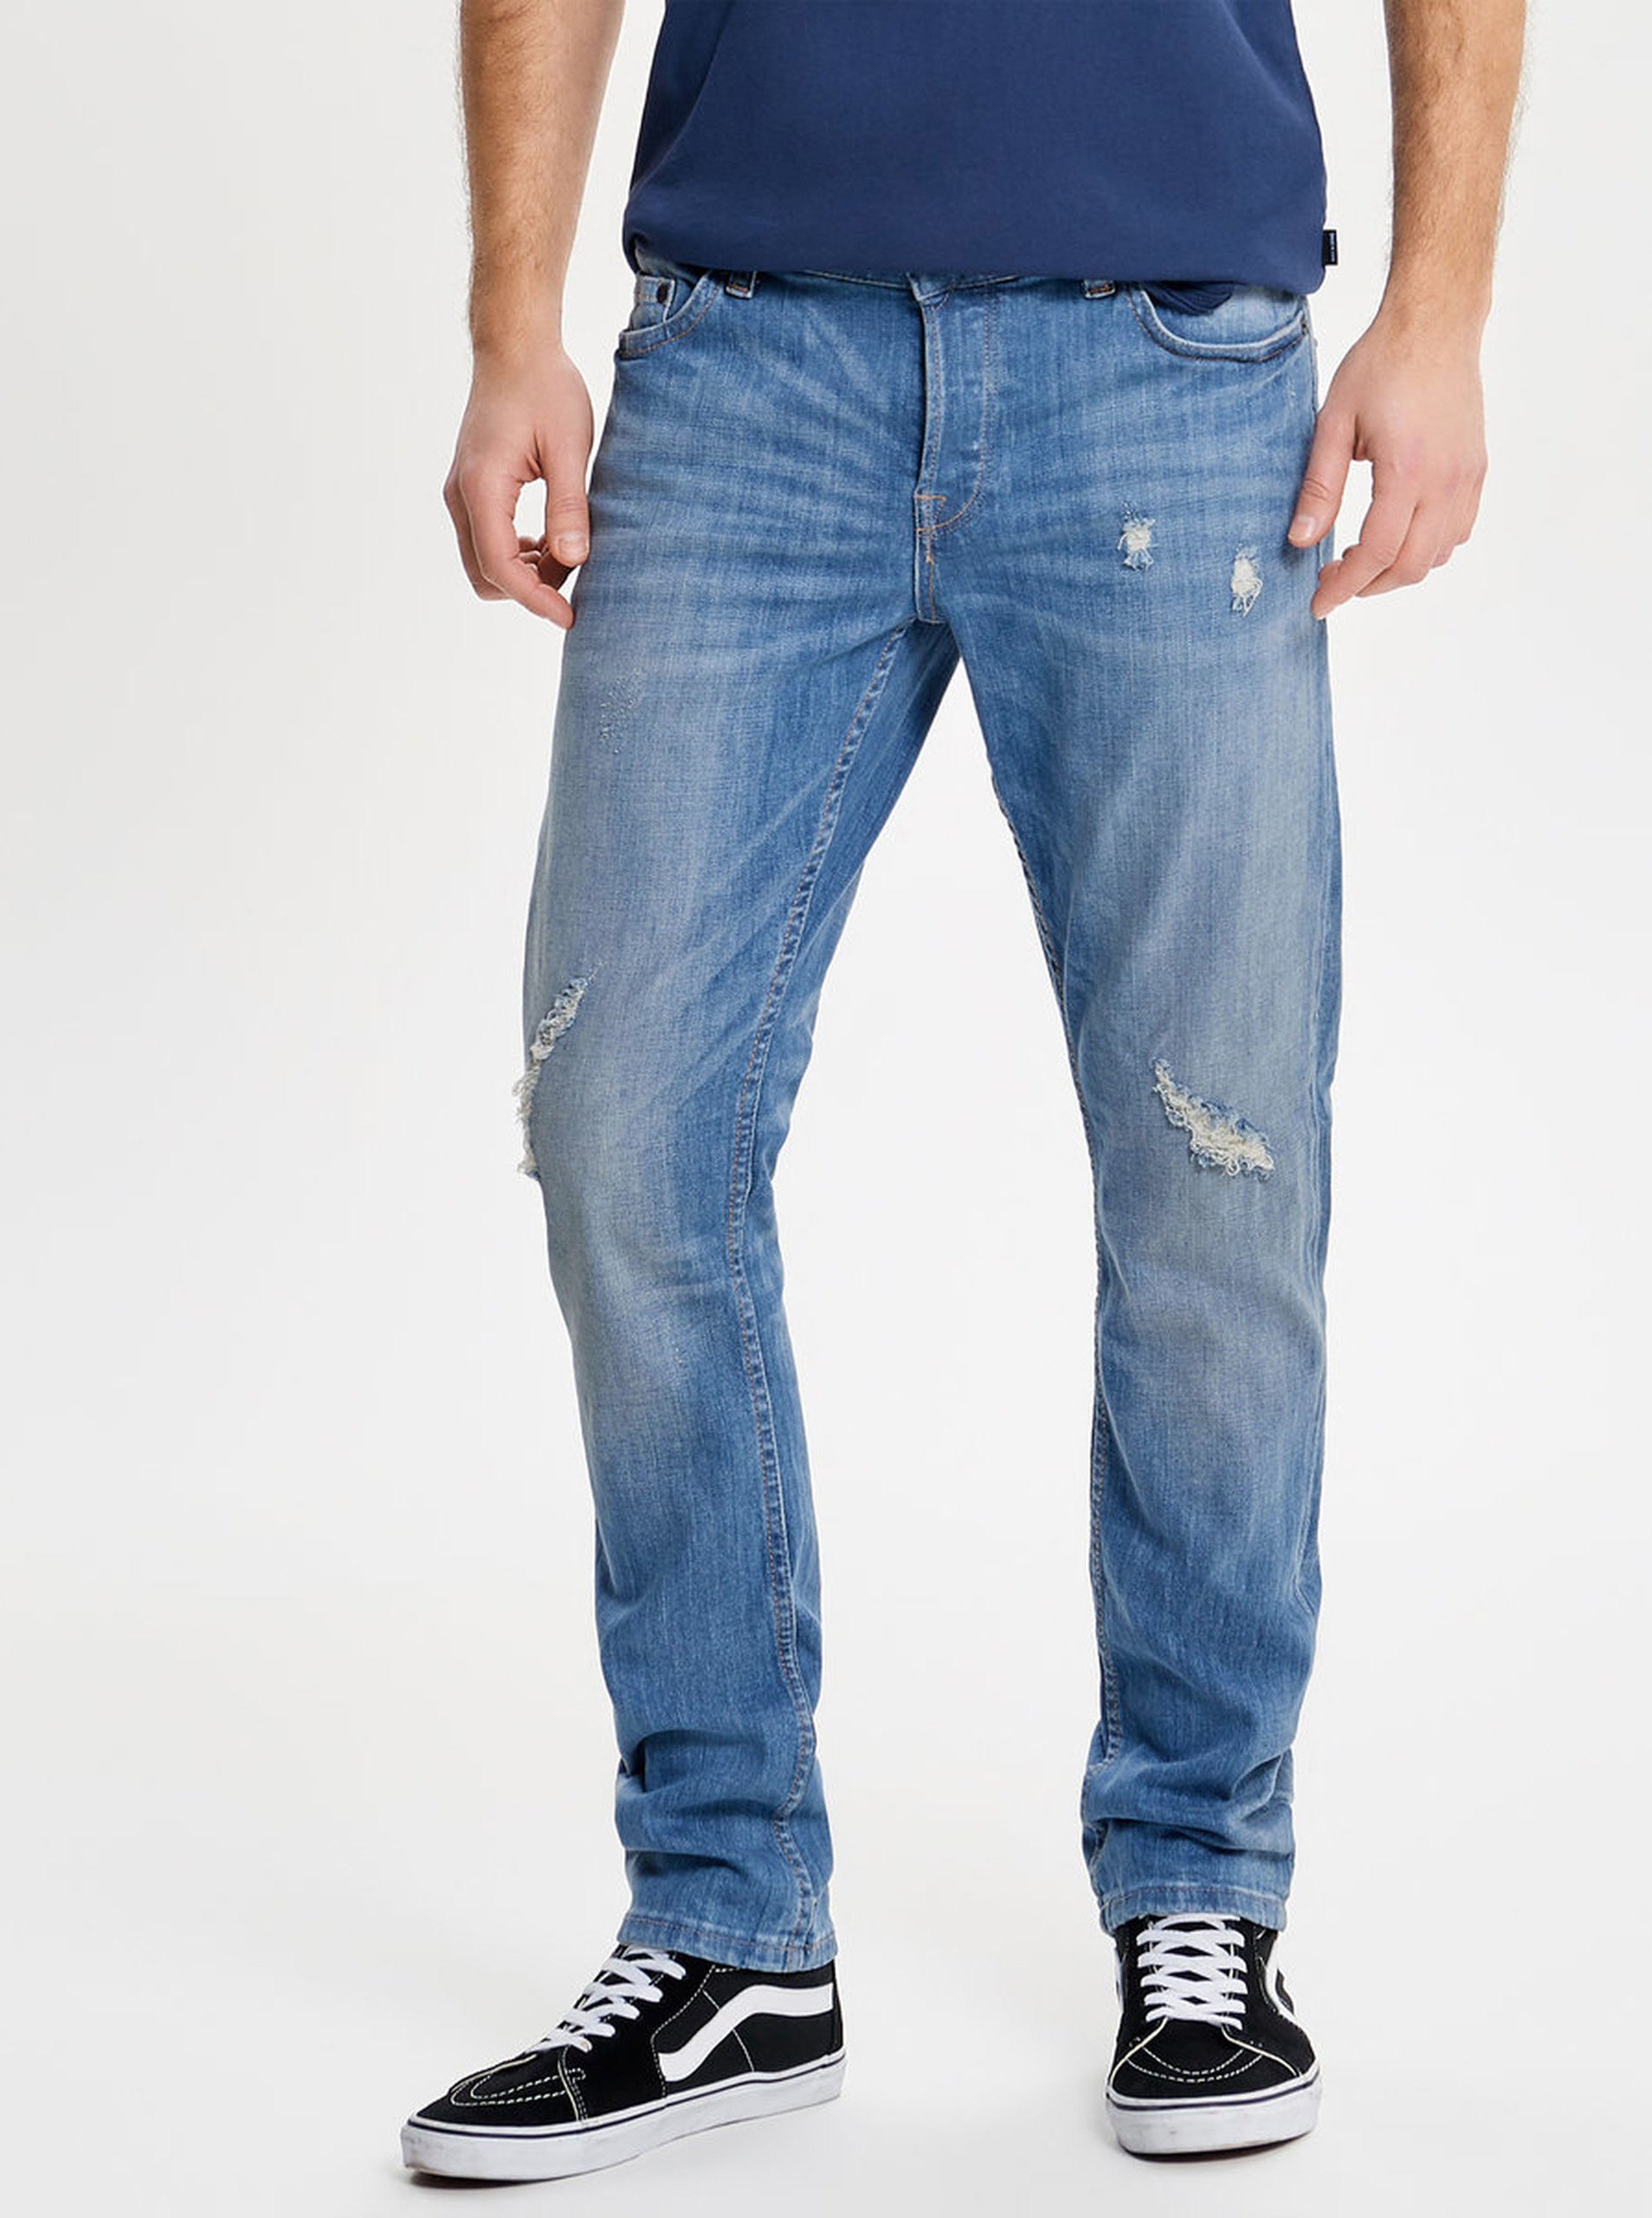 Modré slim fit džíny s potrhaným efektem ONLY   SONS Loom ... 7737d3d208